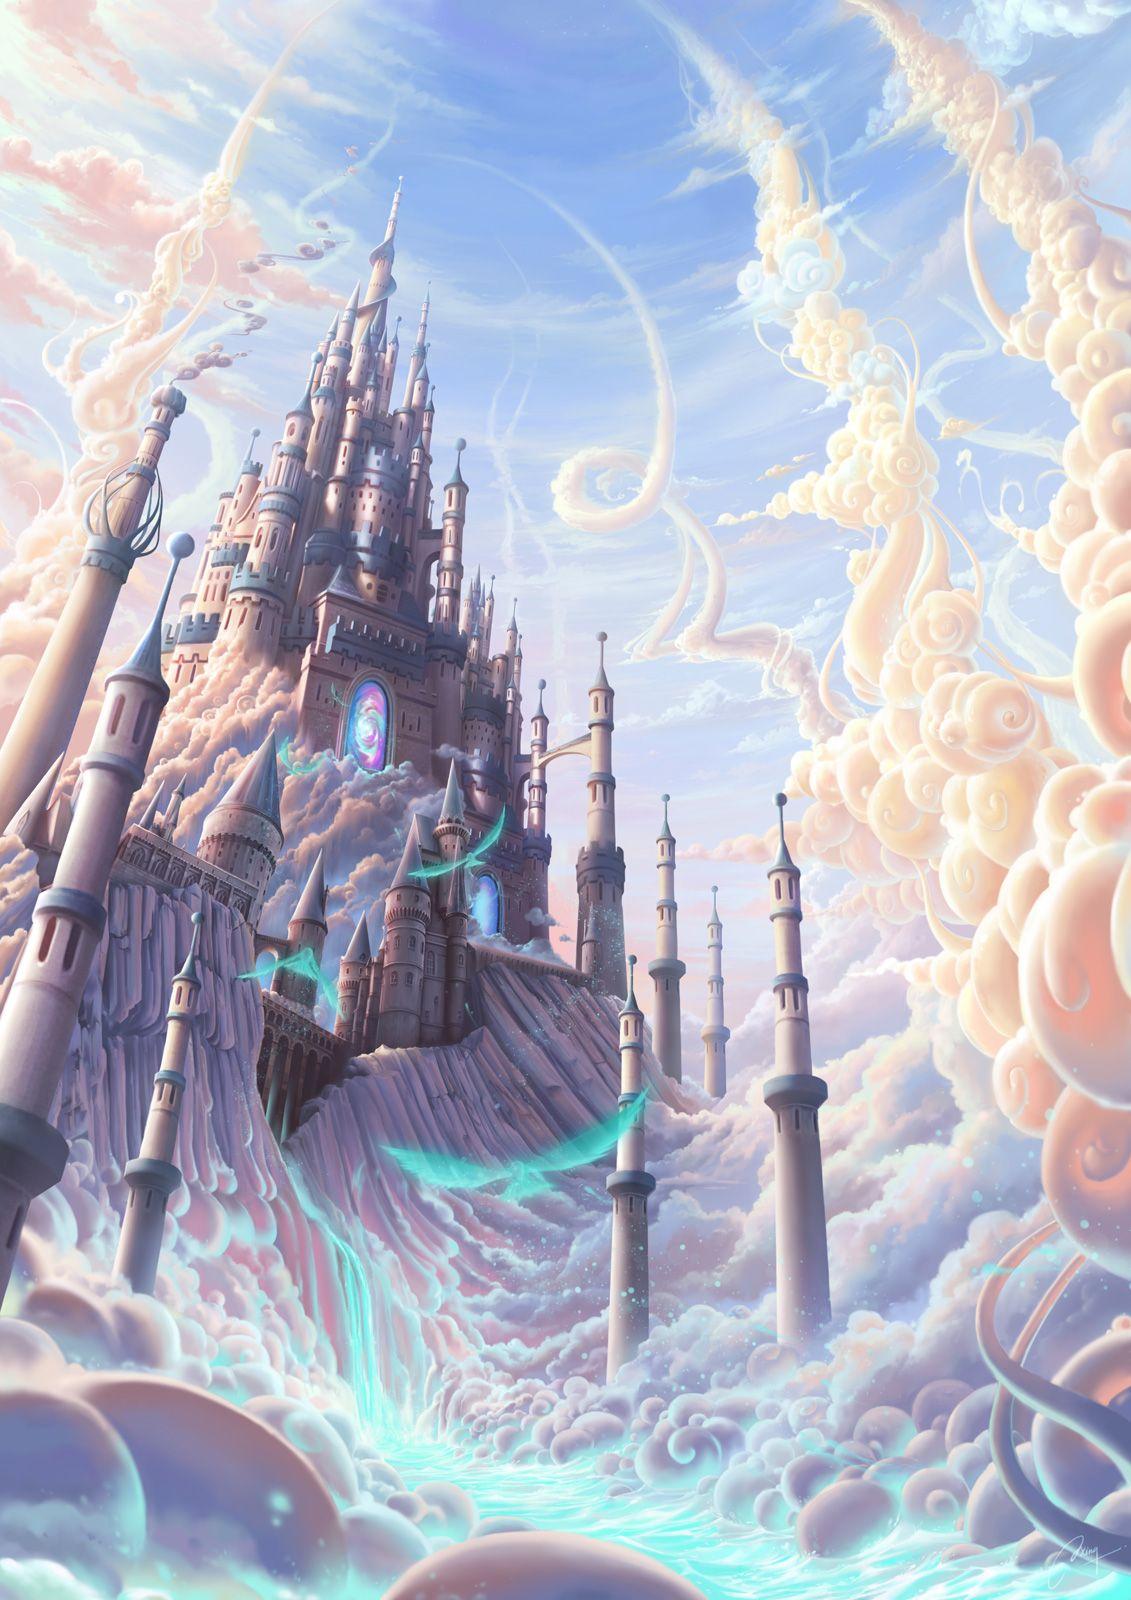 magic castle fantasy world - photo #1